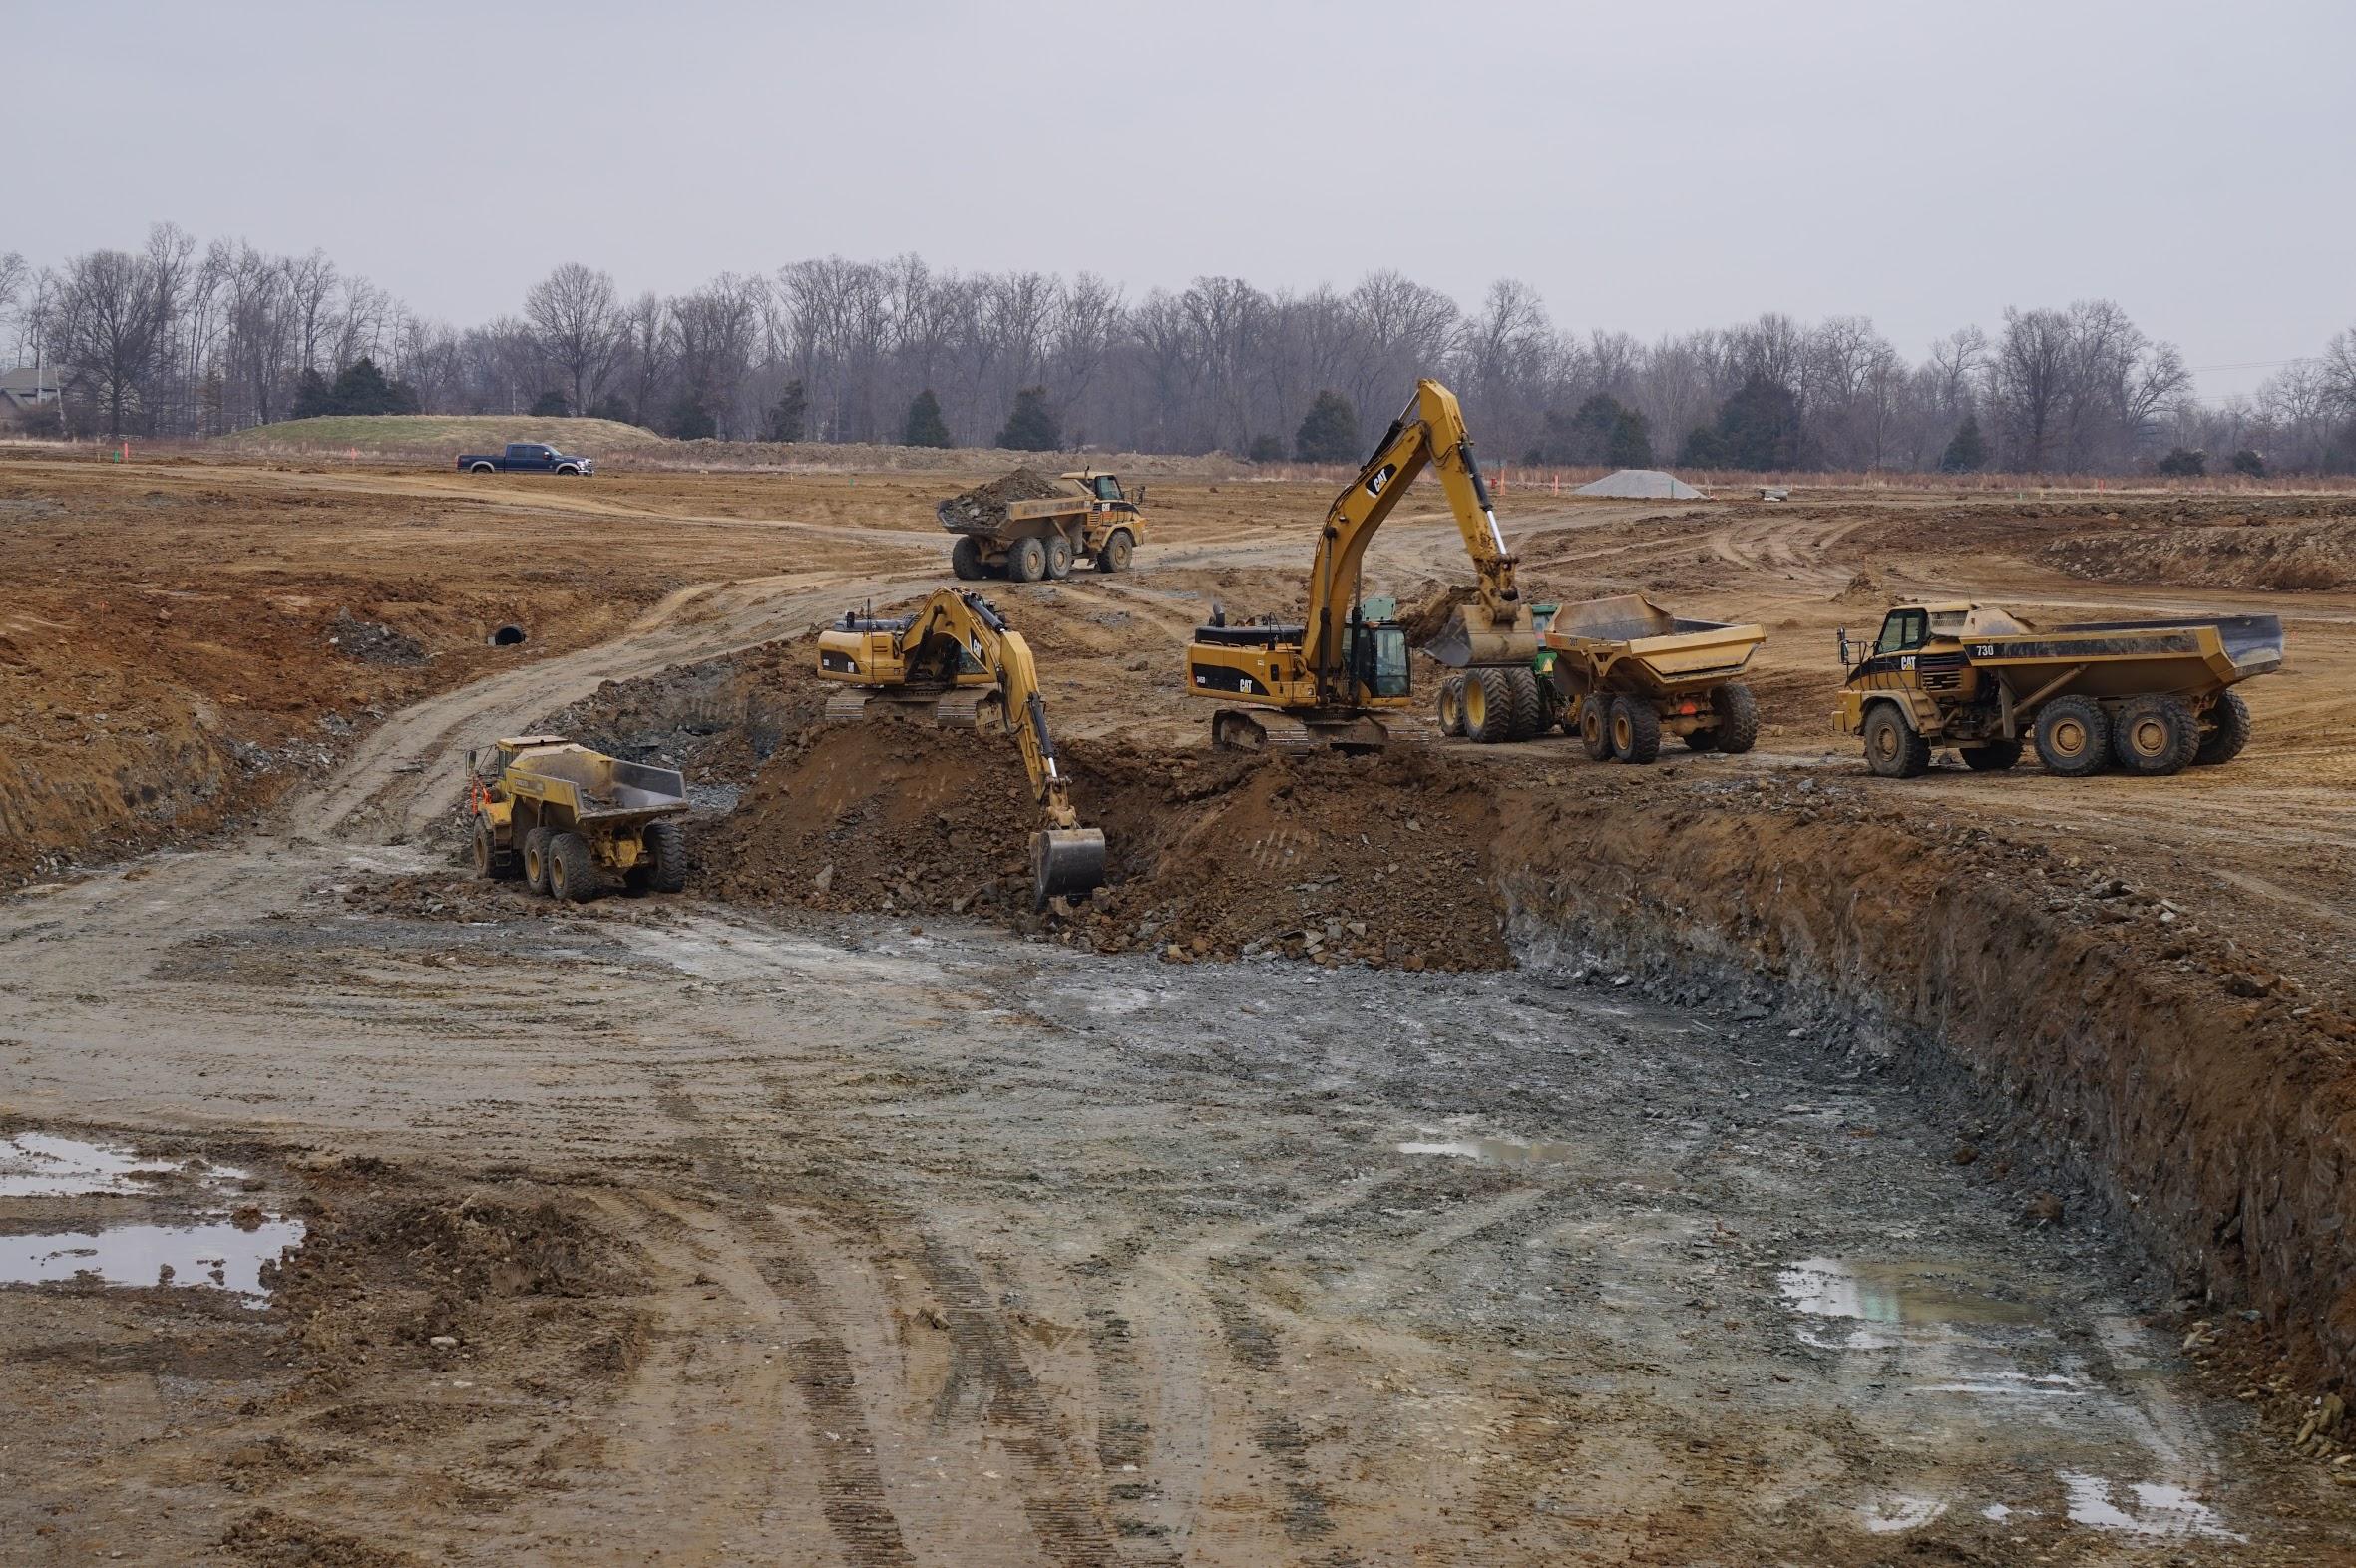 Excavation Services - Development to Meet your Needs